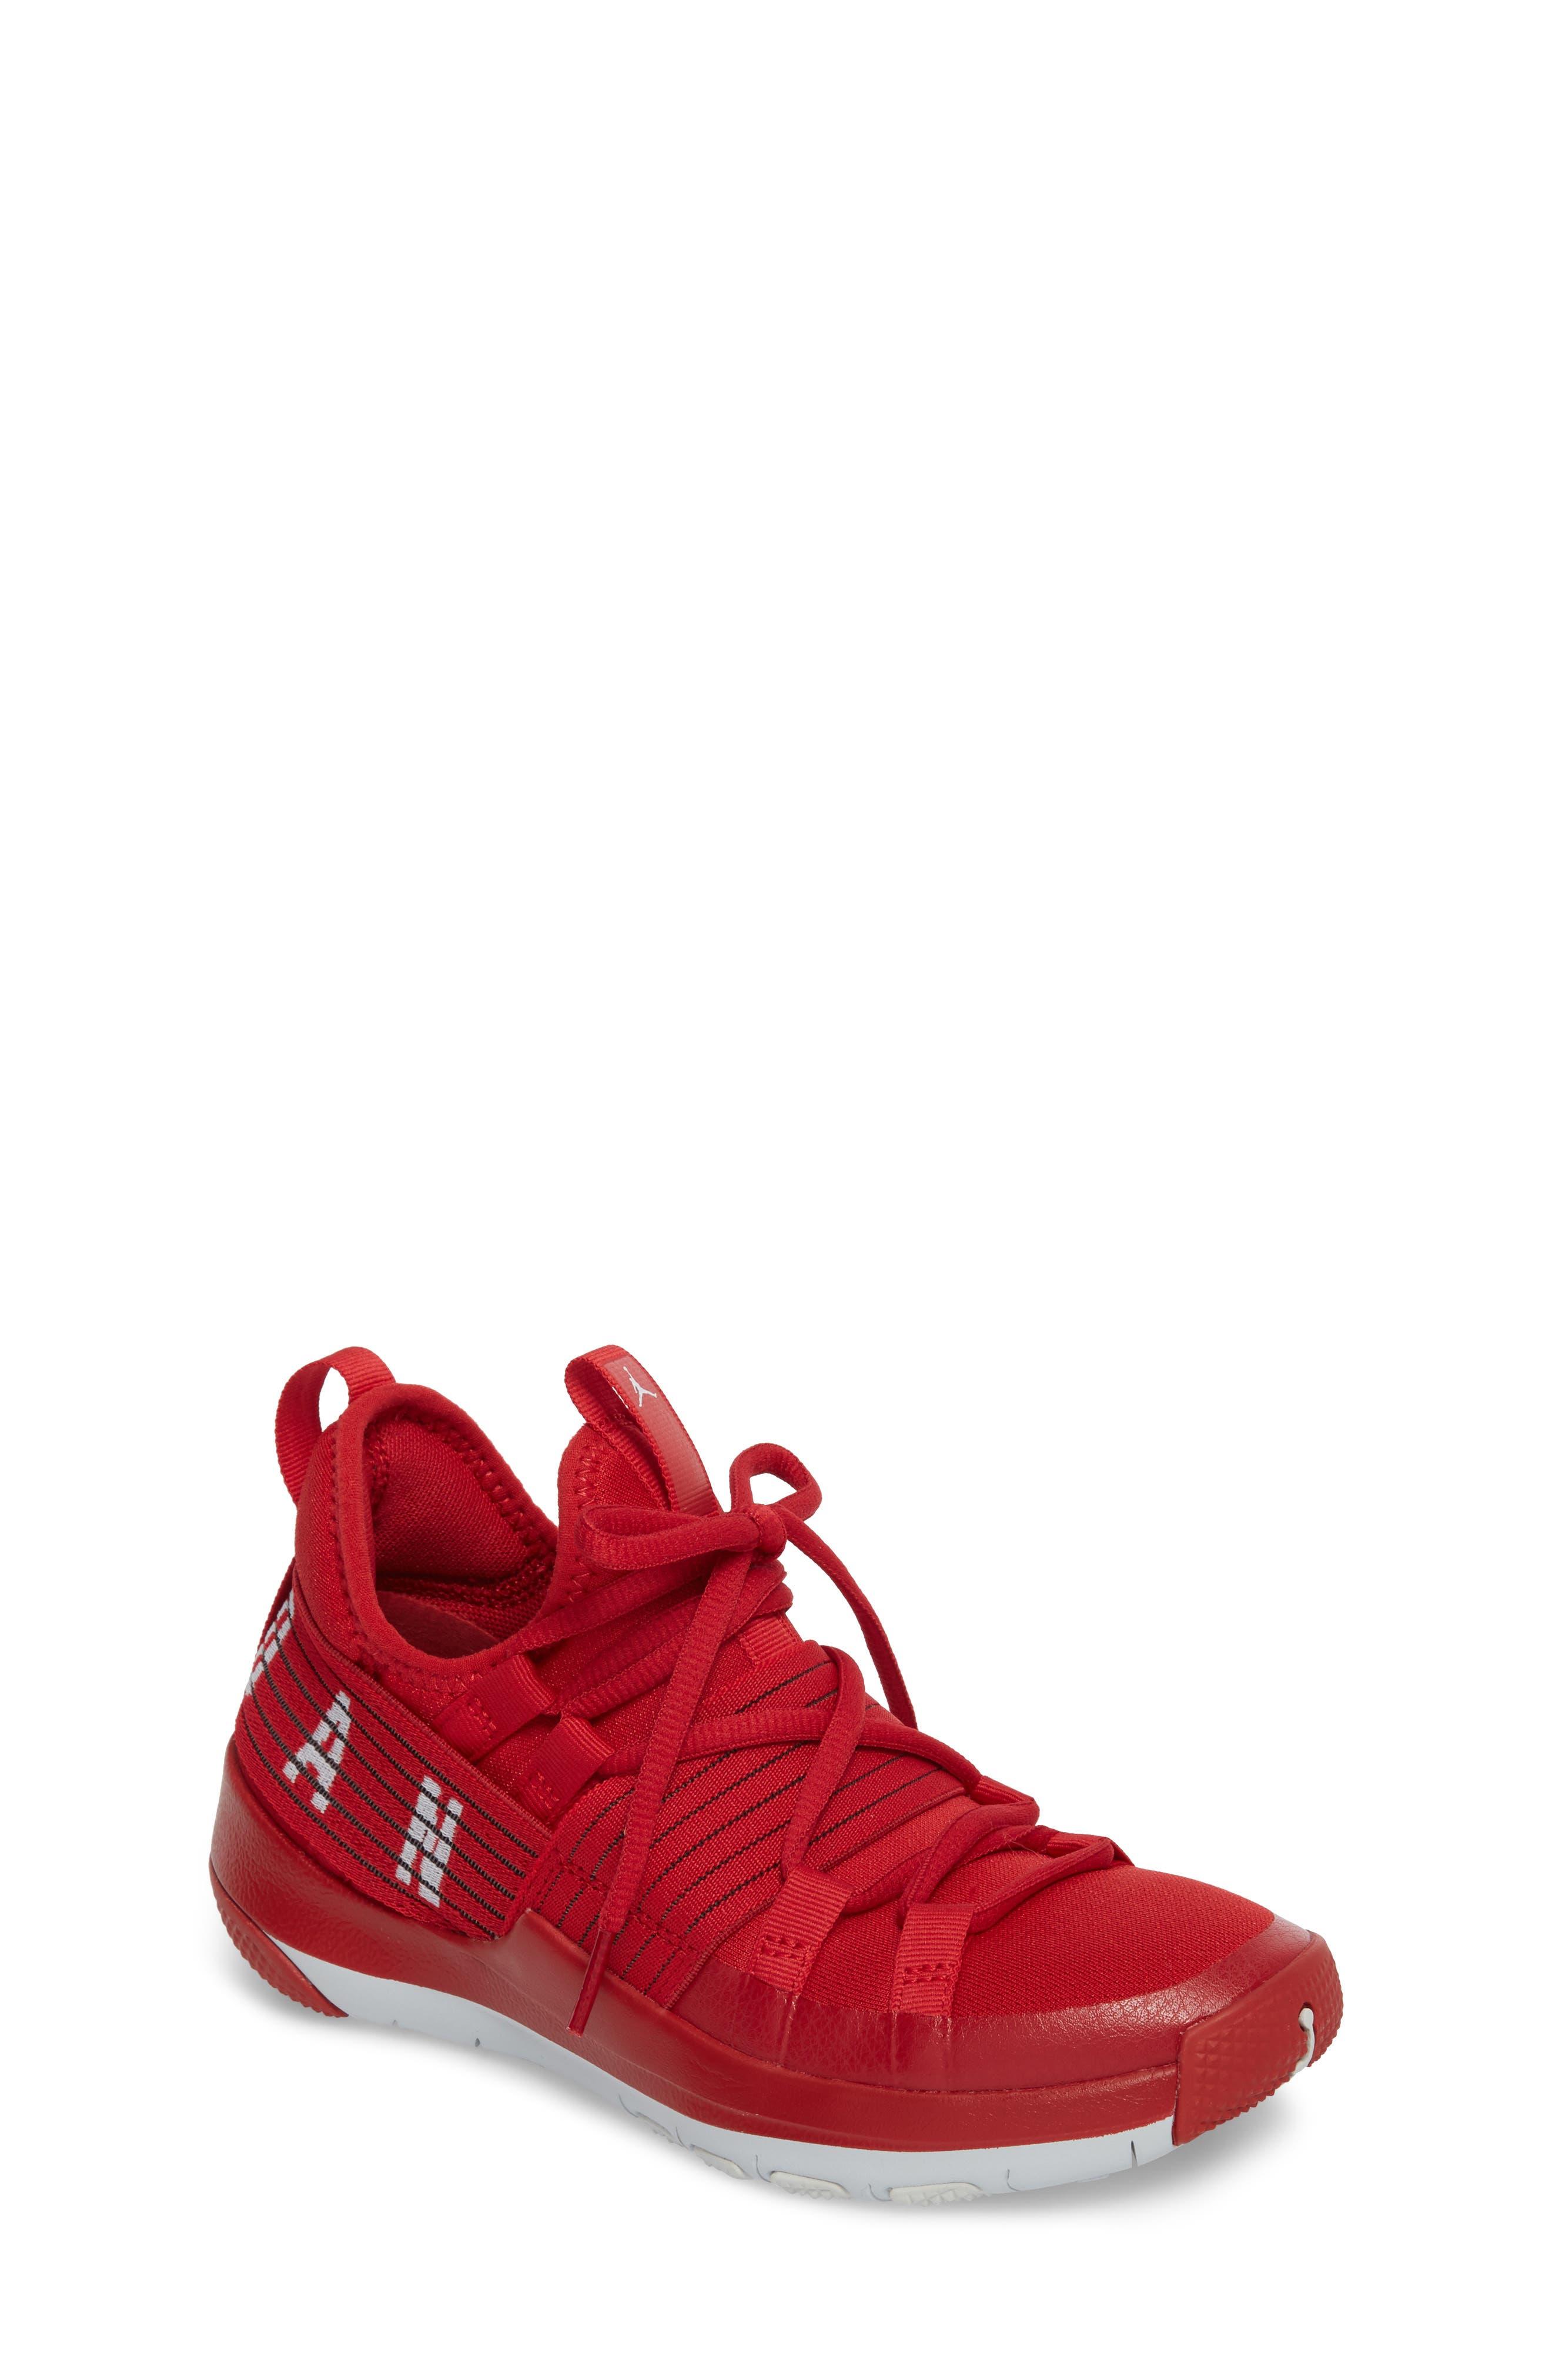 Trainer Pro Training Shoe,                             Main thumbnail 1, color,                             Gym Red/ Pure Platinum